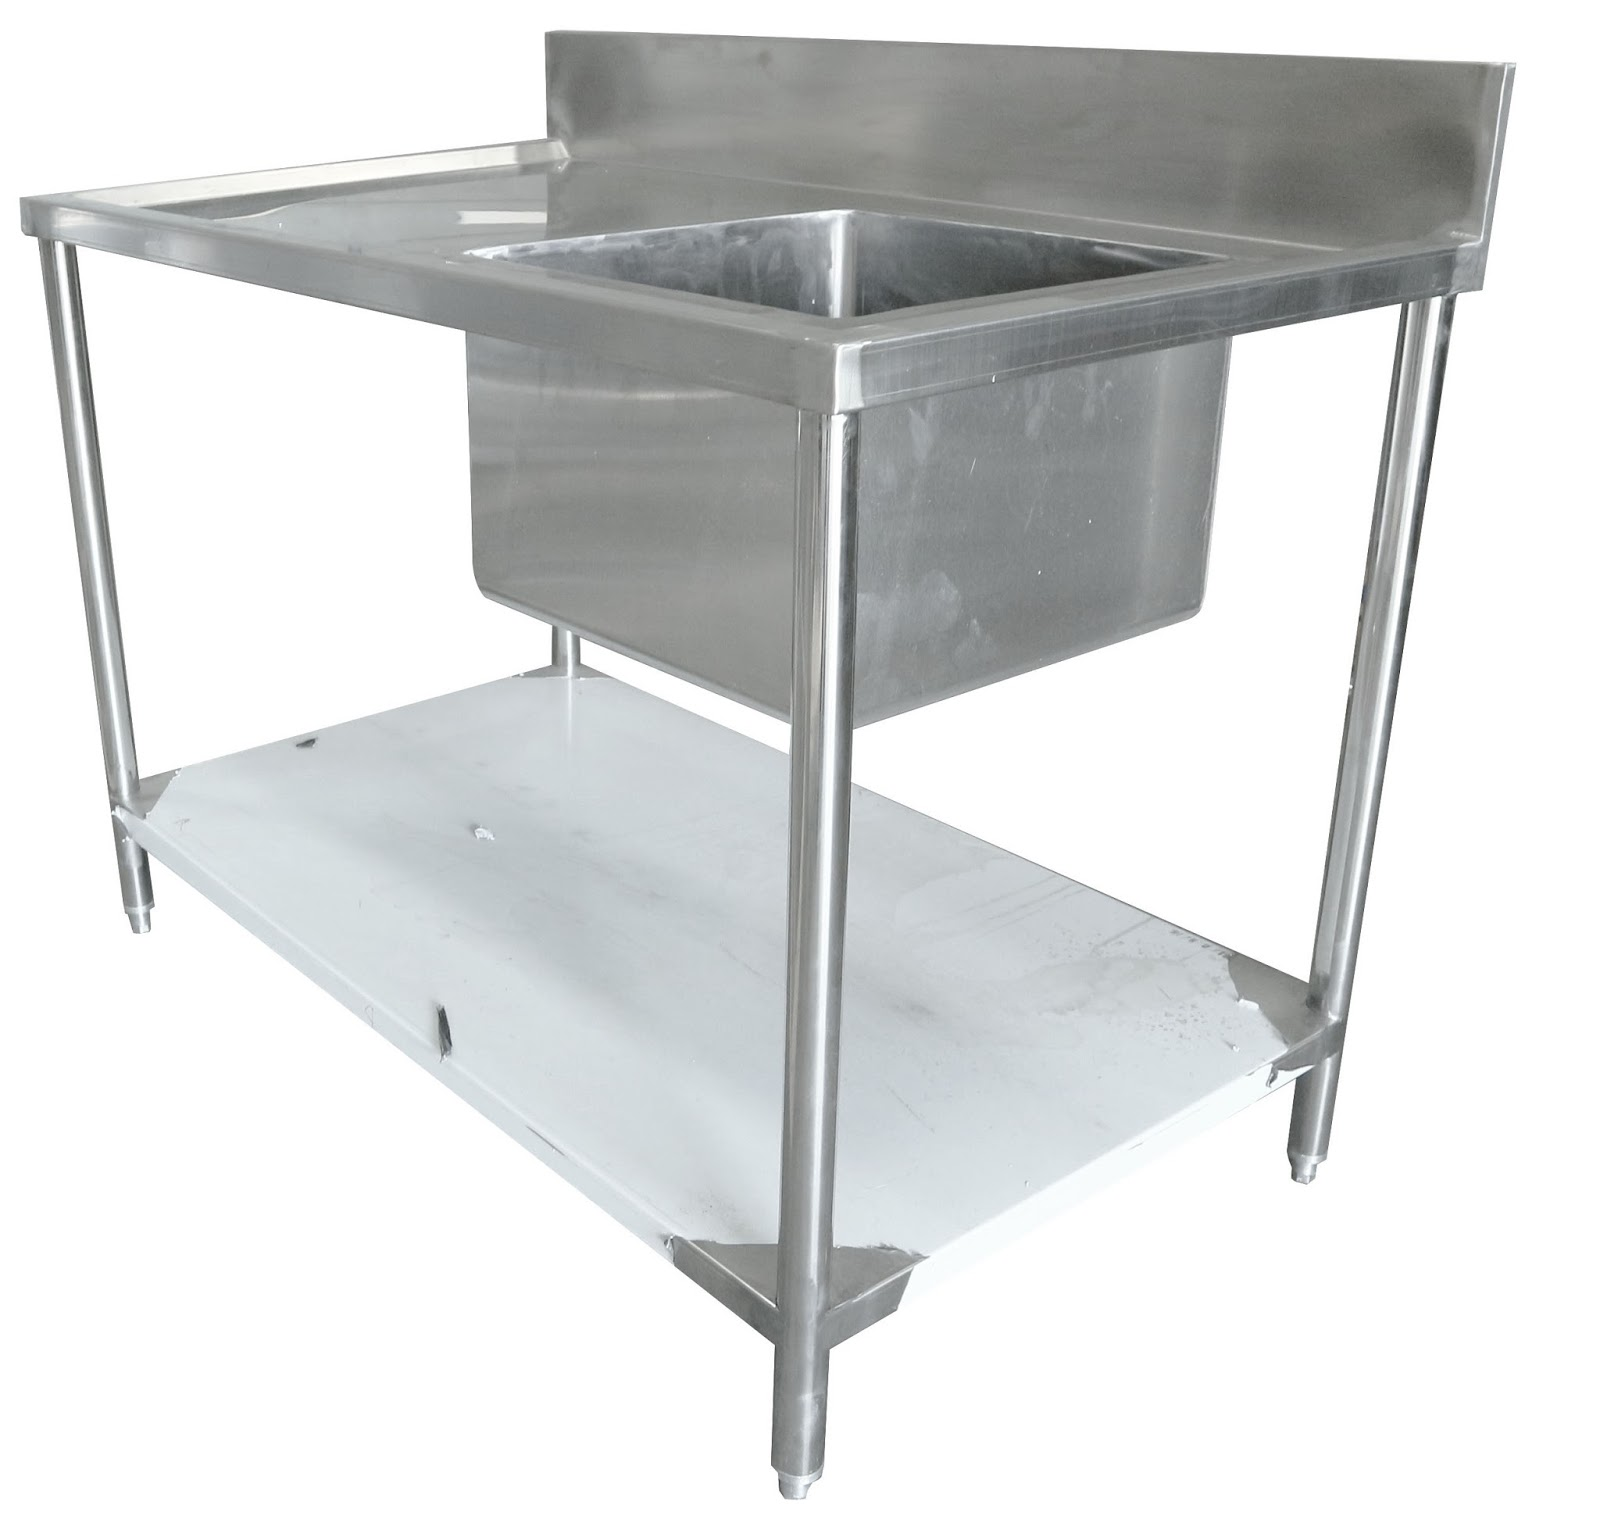 kitchen+set+permeter+meja+sink+1+bowl.jpg